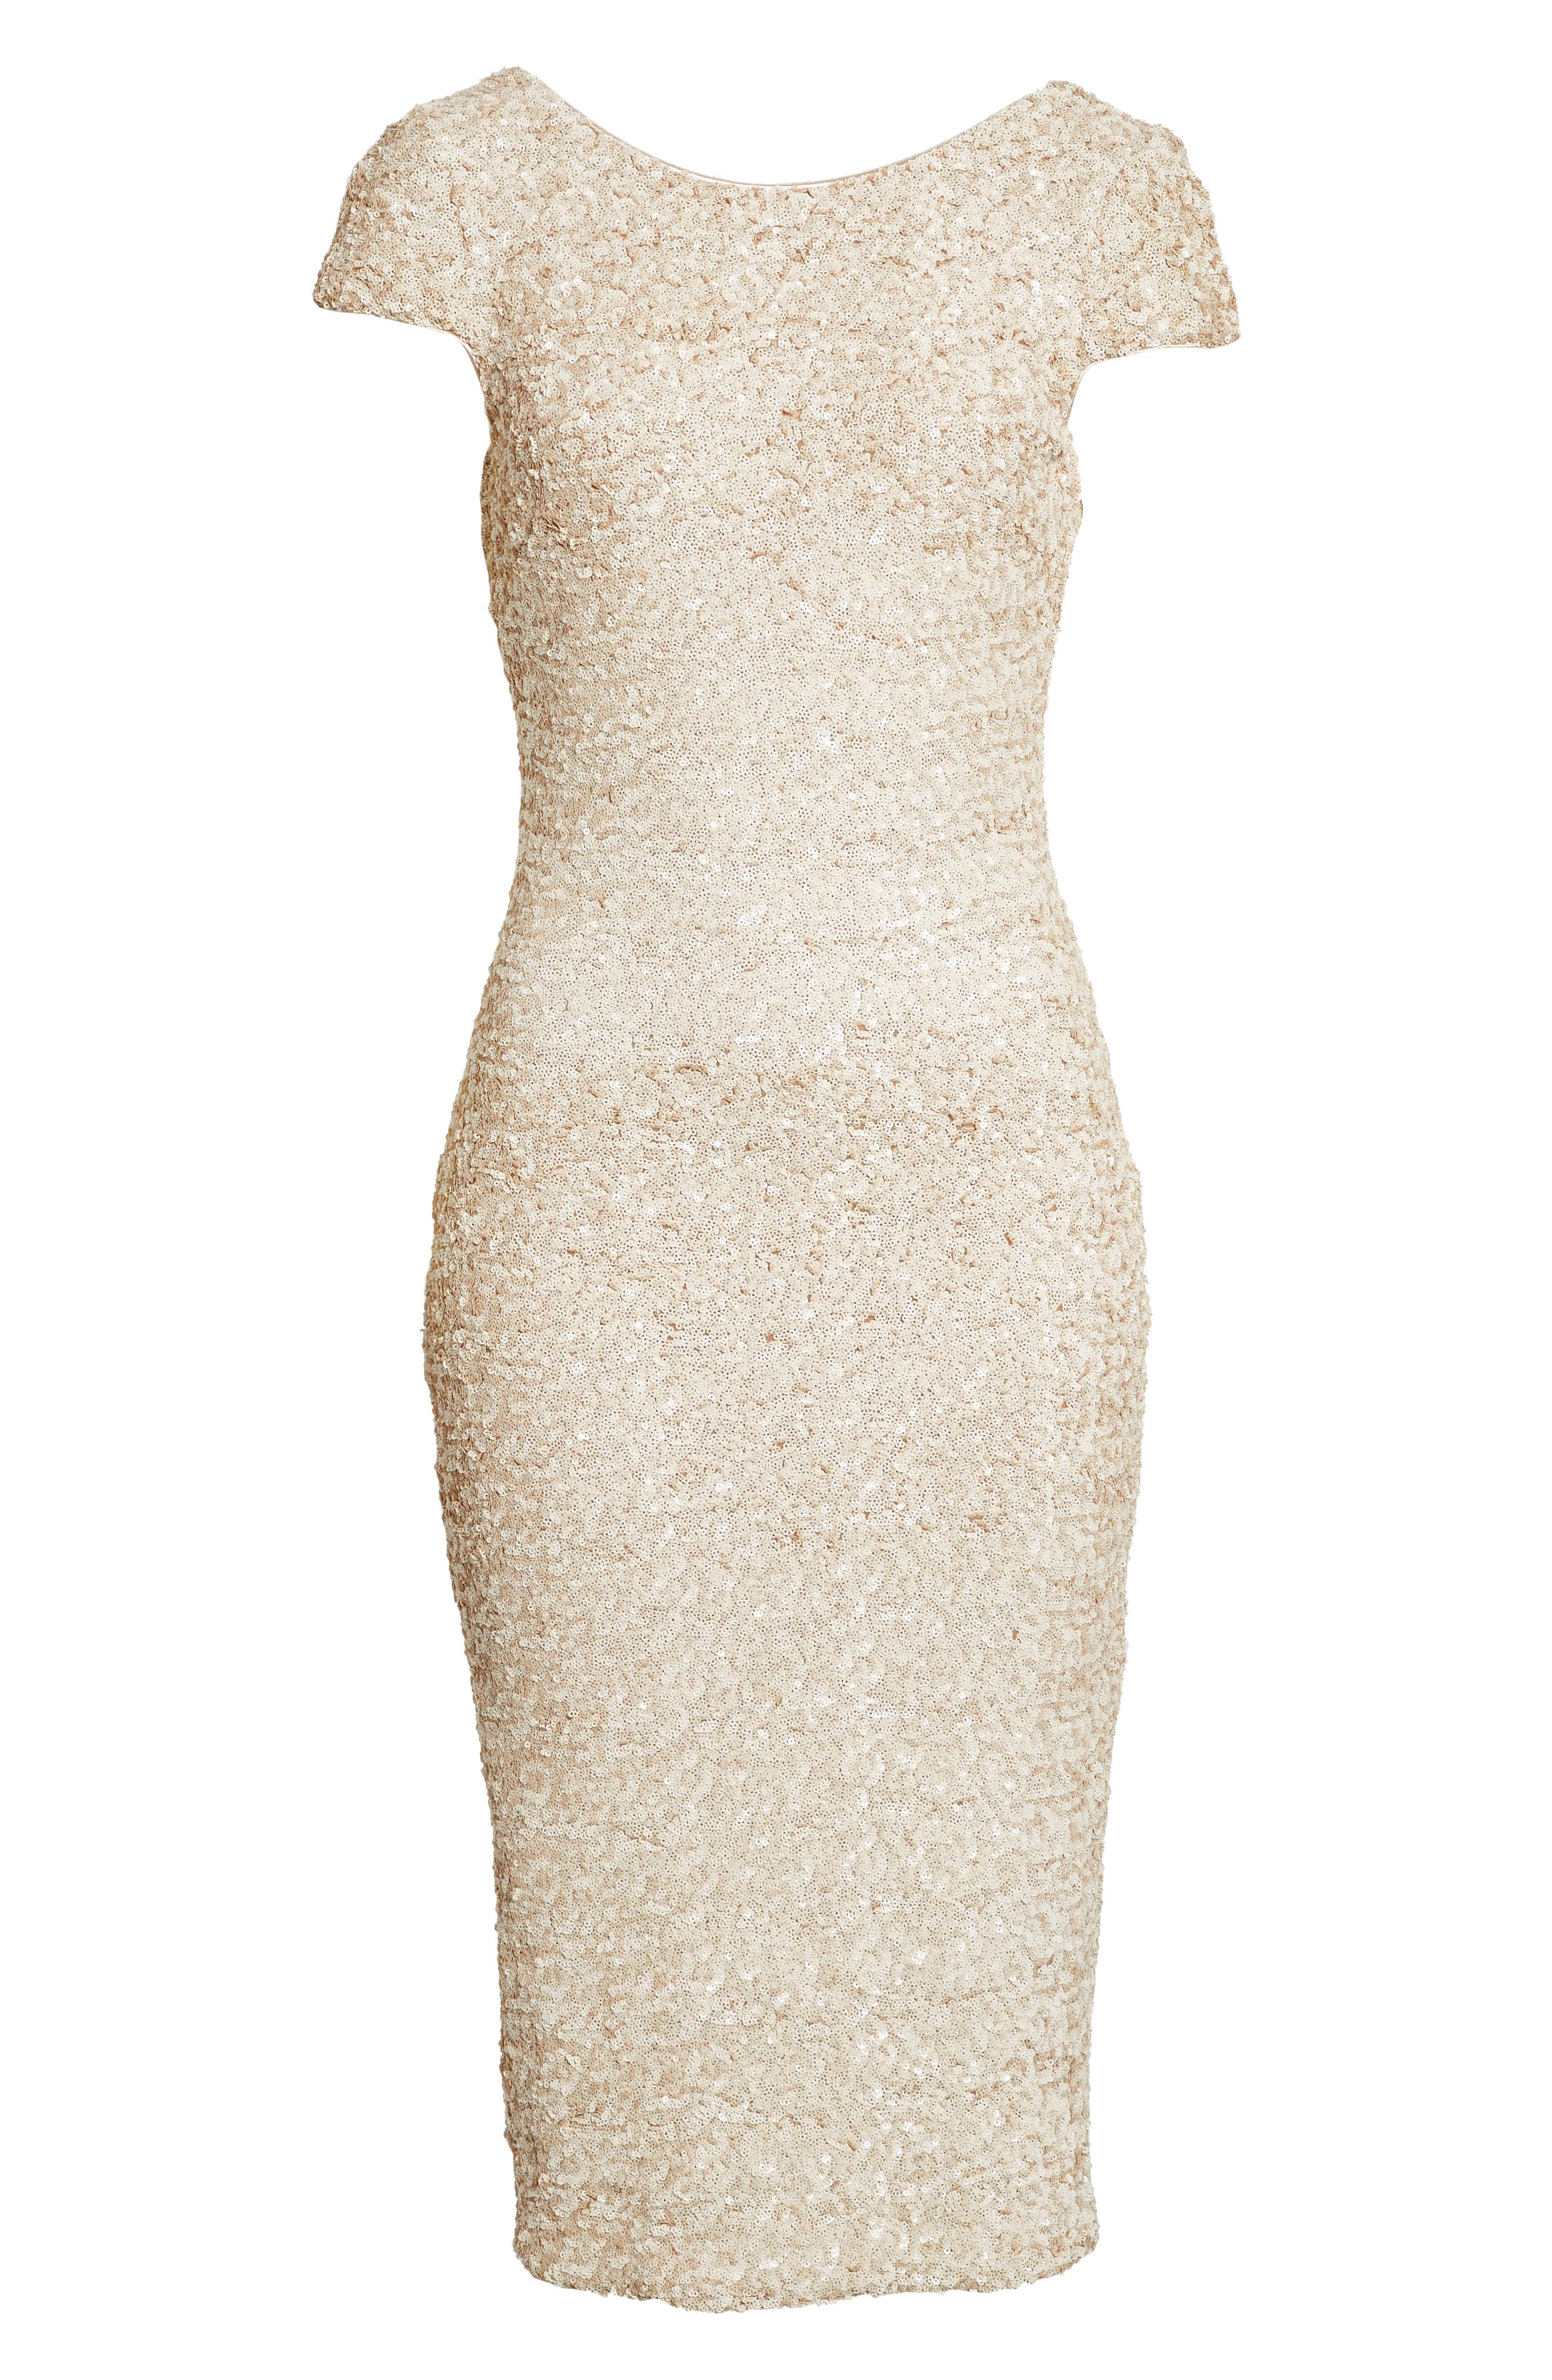 Marcella Sequin Midi Dress,                             Alternate thumbnail 4, color,                             271